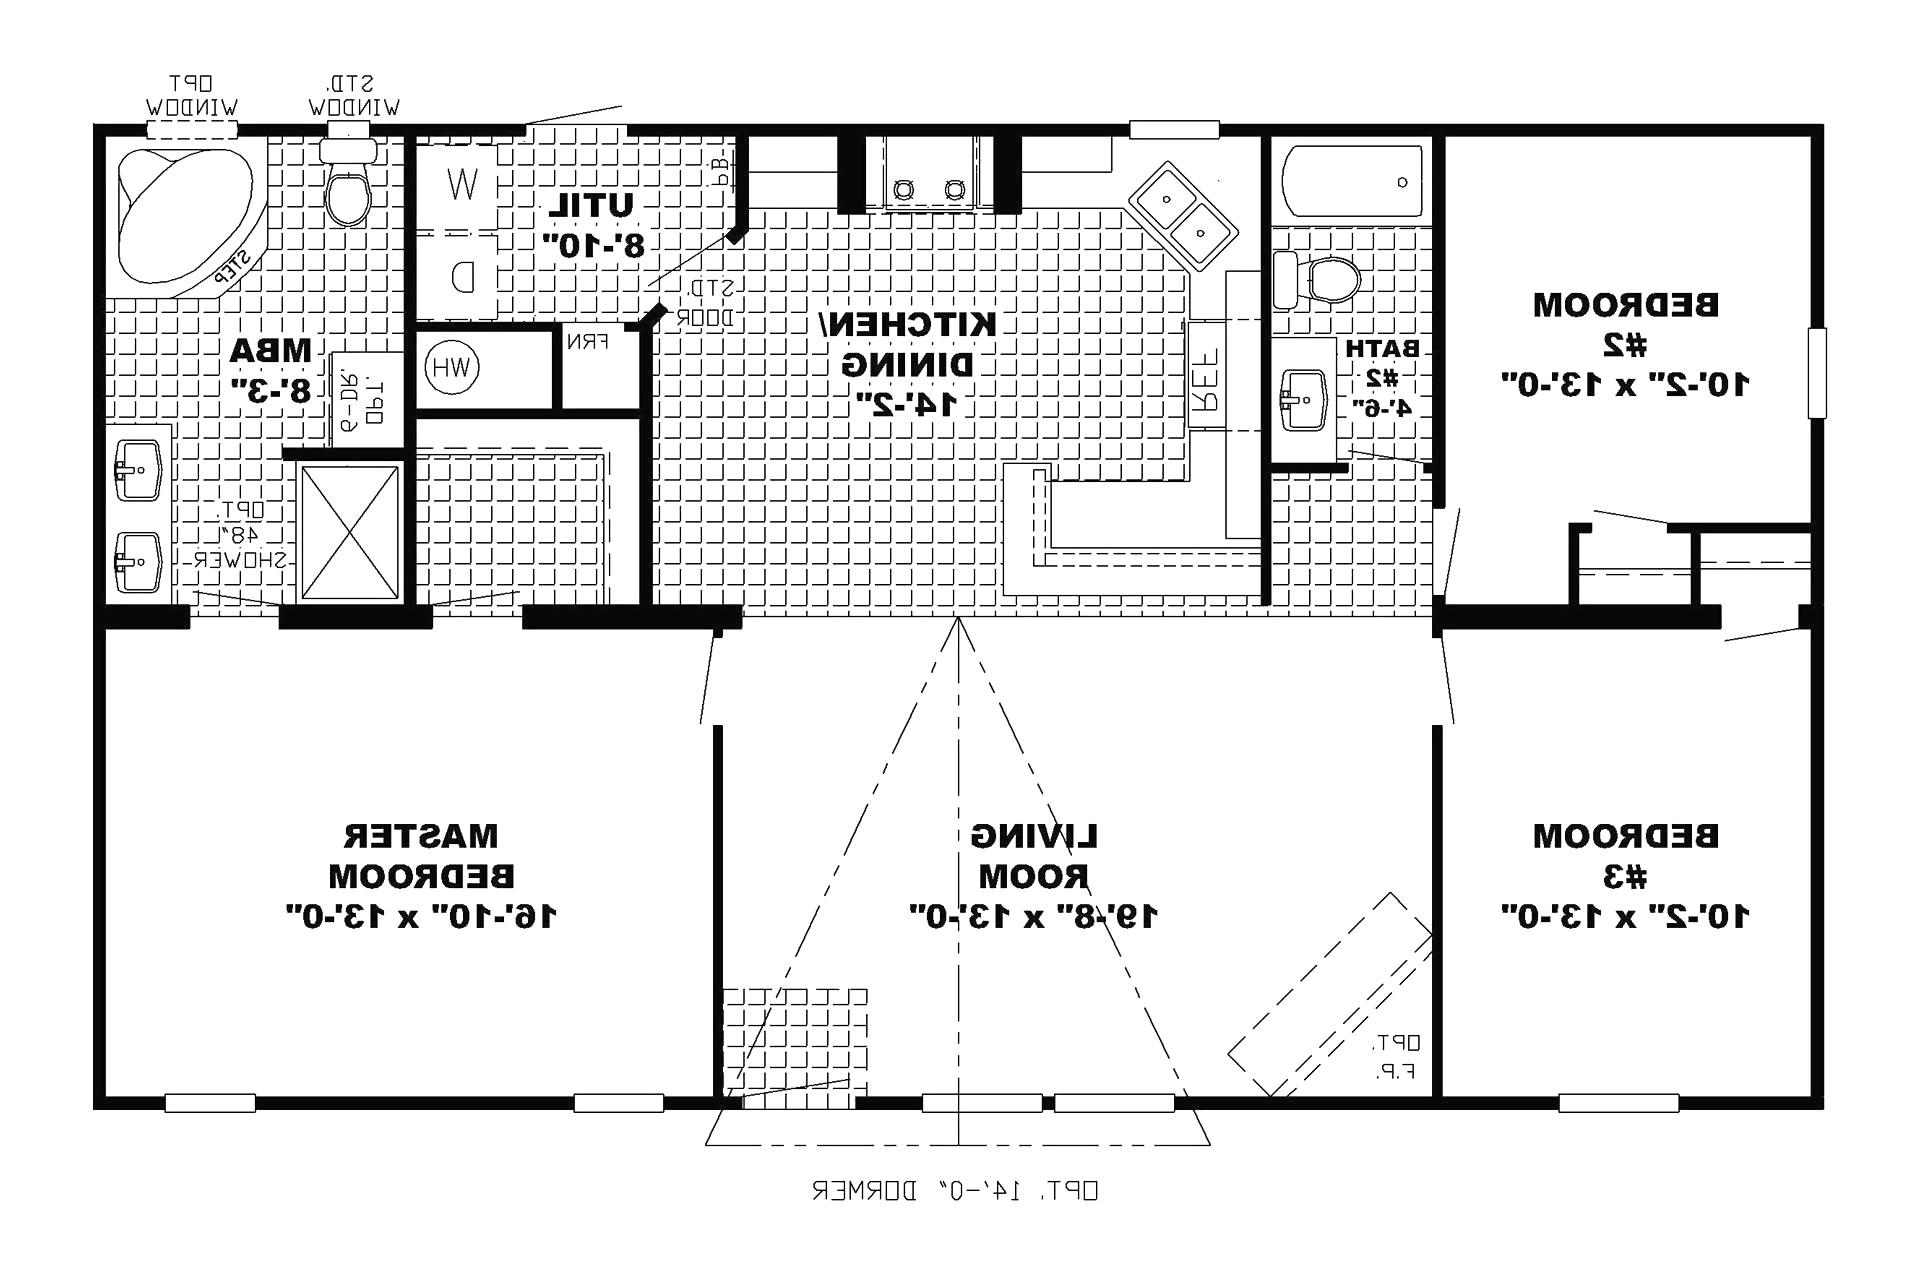 a 3bedroom simple floor plan